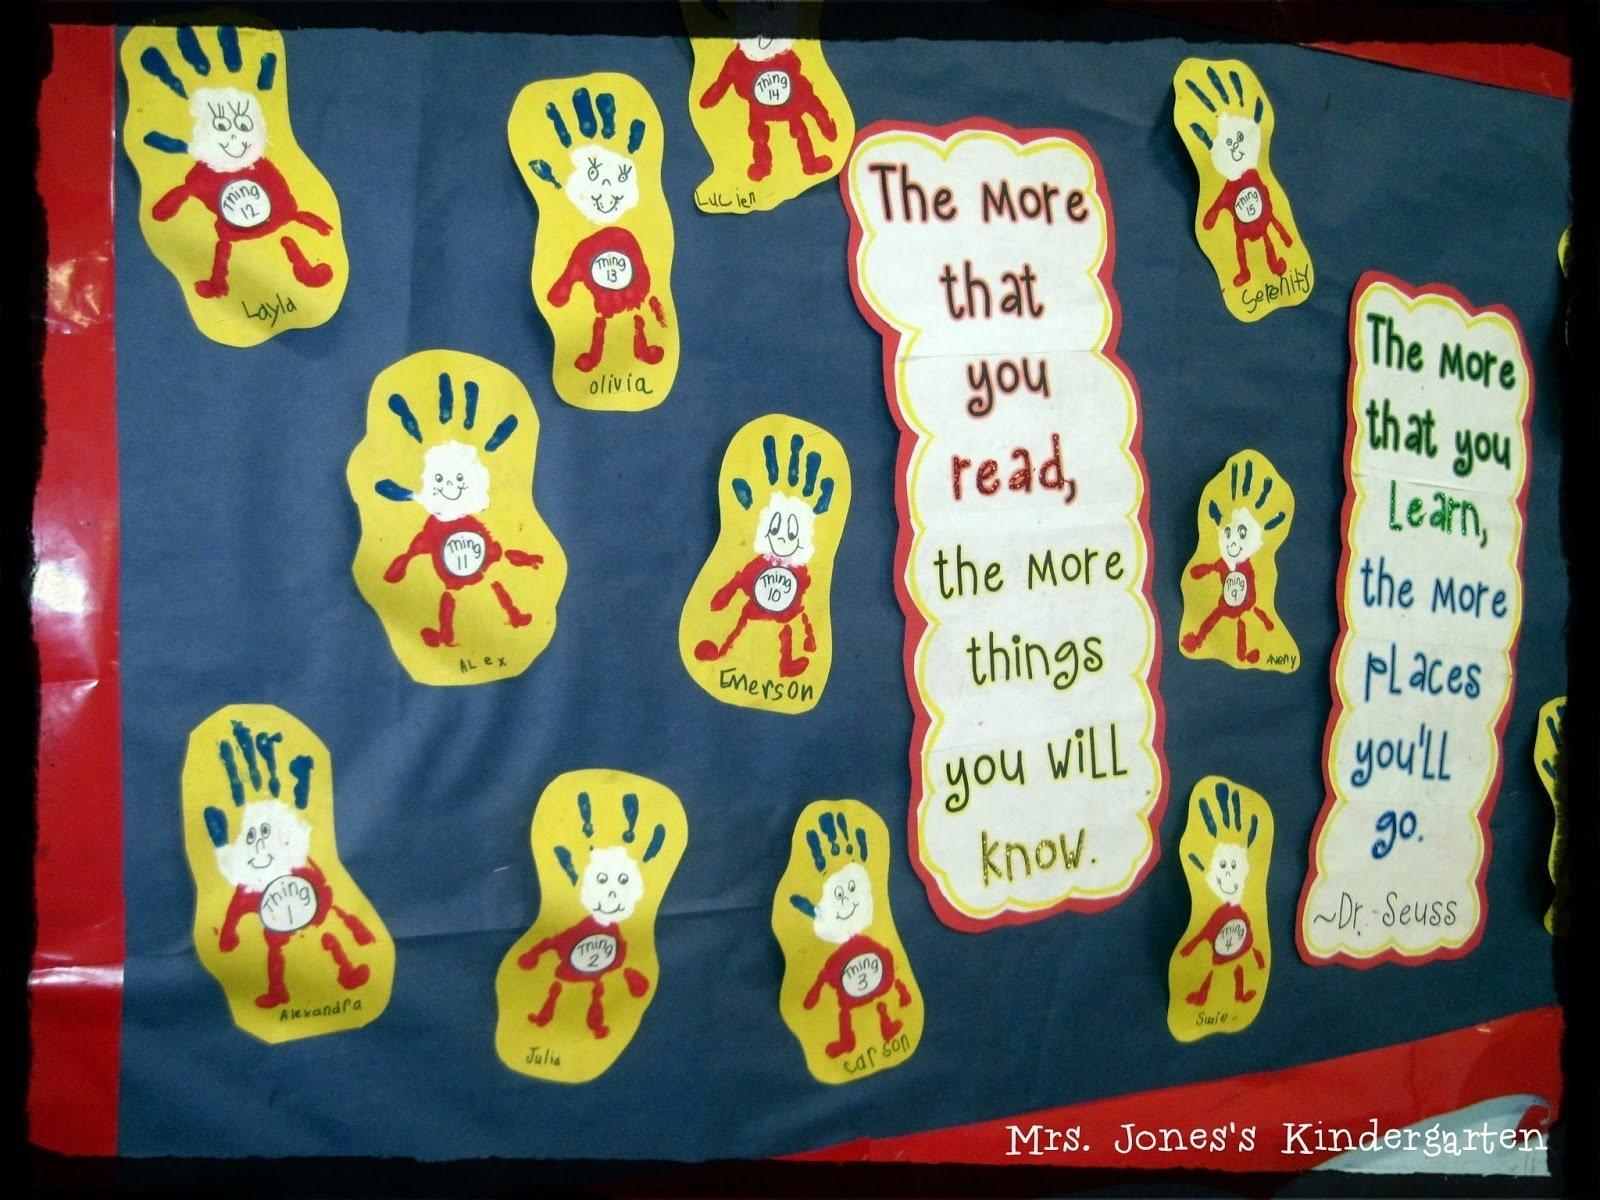 10 Best Dr. Seuss Bulletin Board Ideas For Kindergarten a seuss rhyme mrs joness kindergarten 1 2021